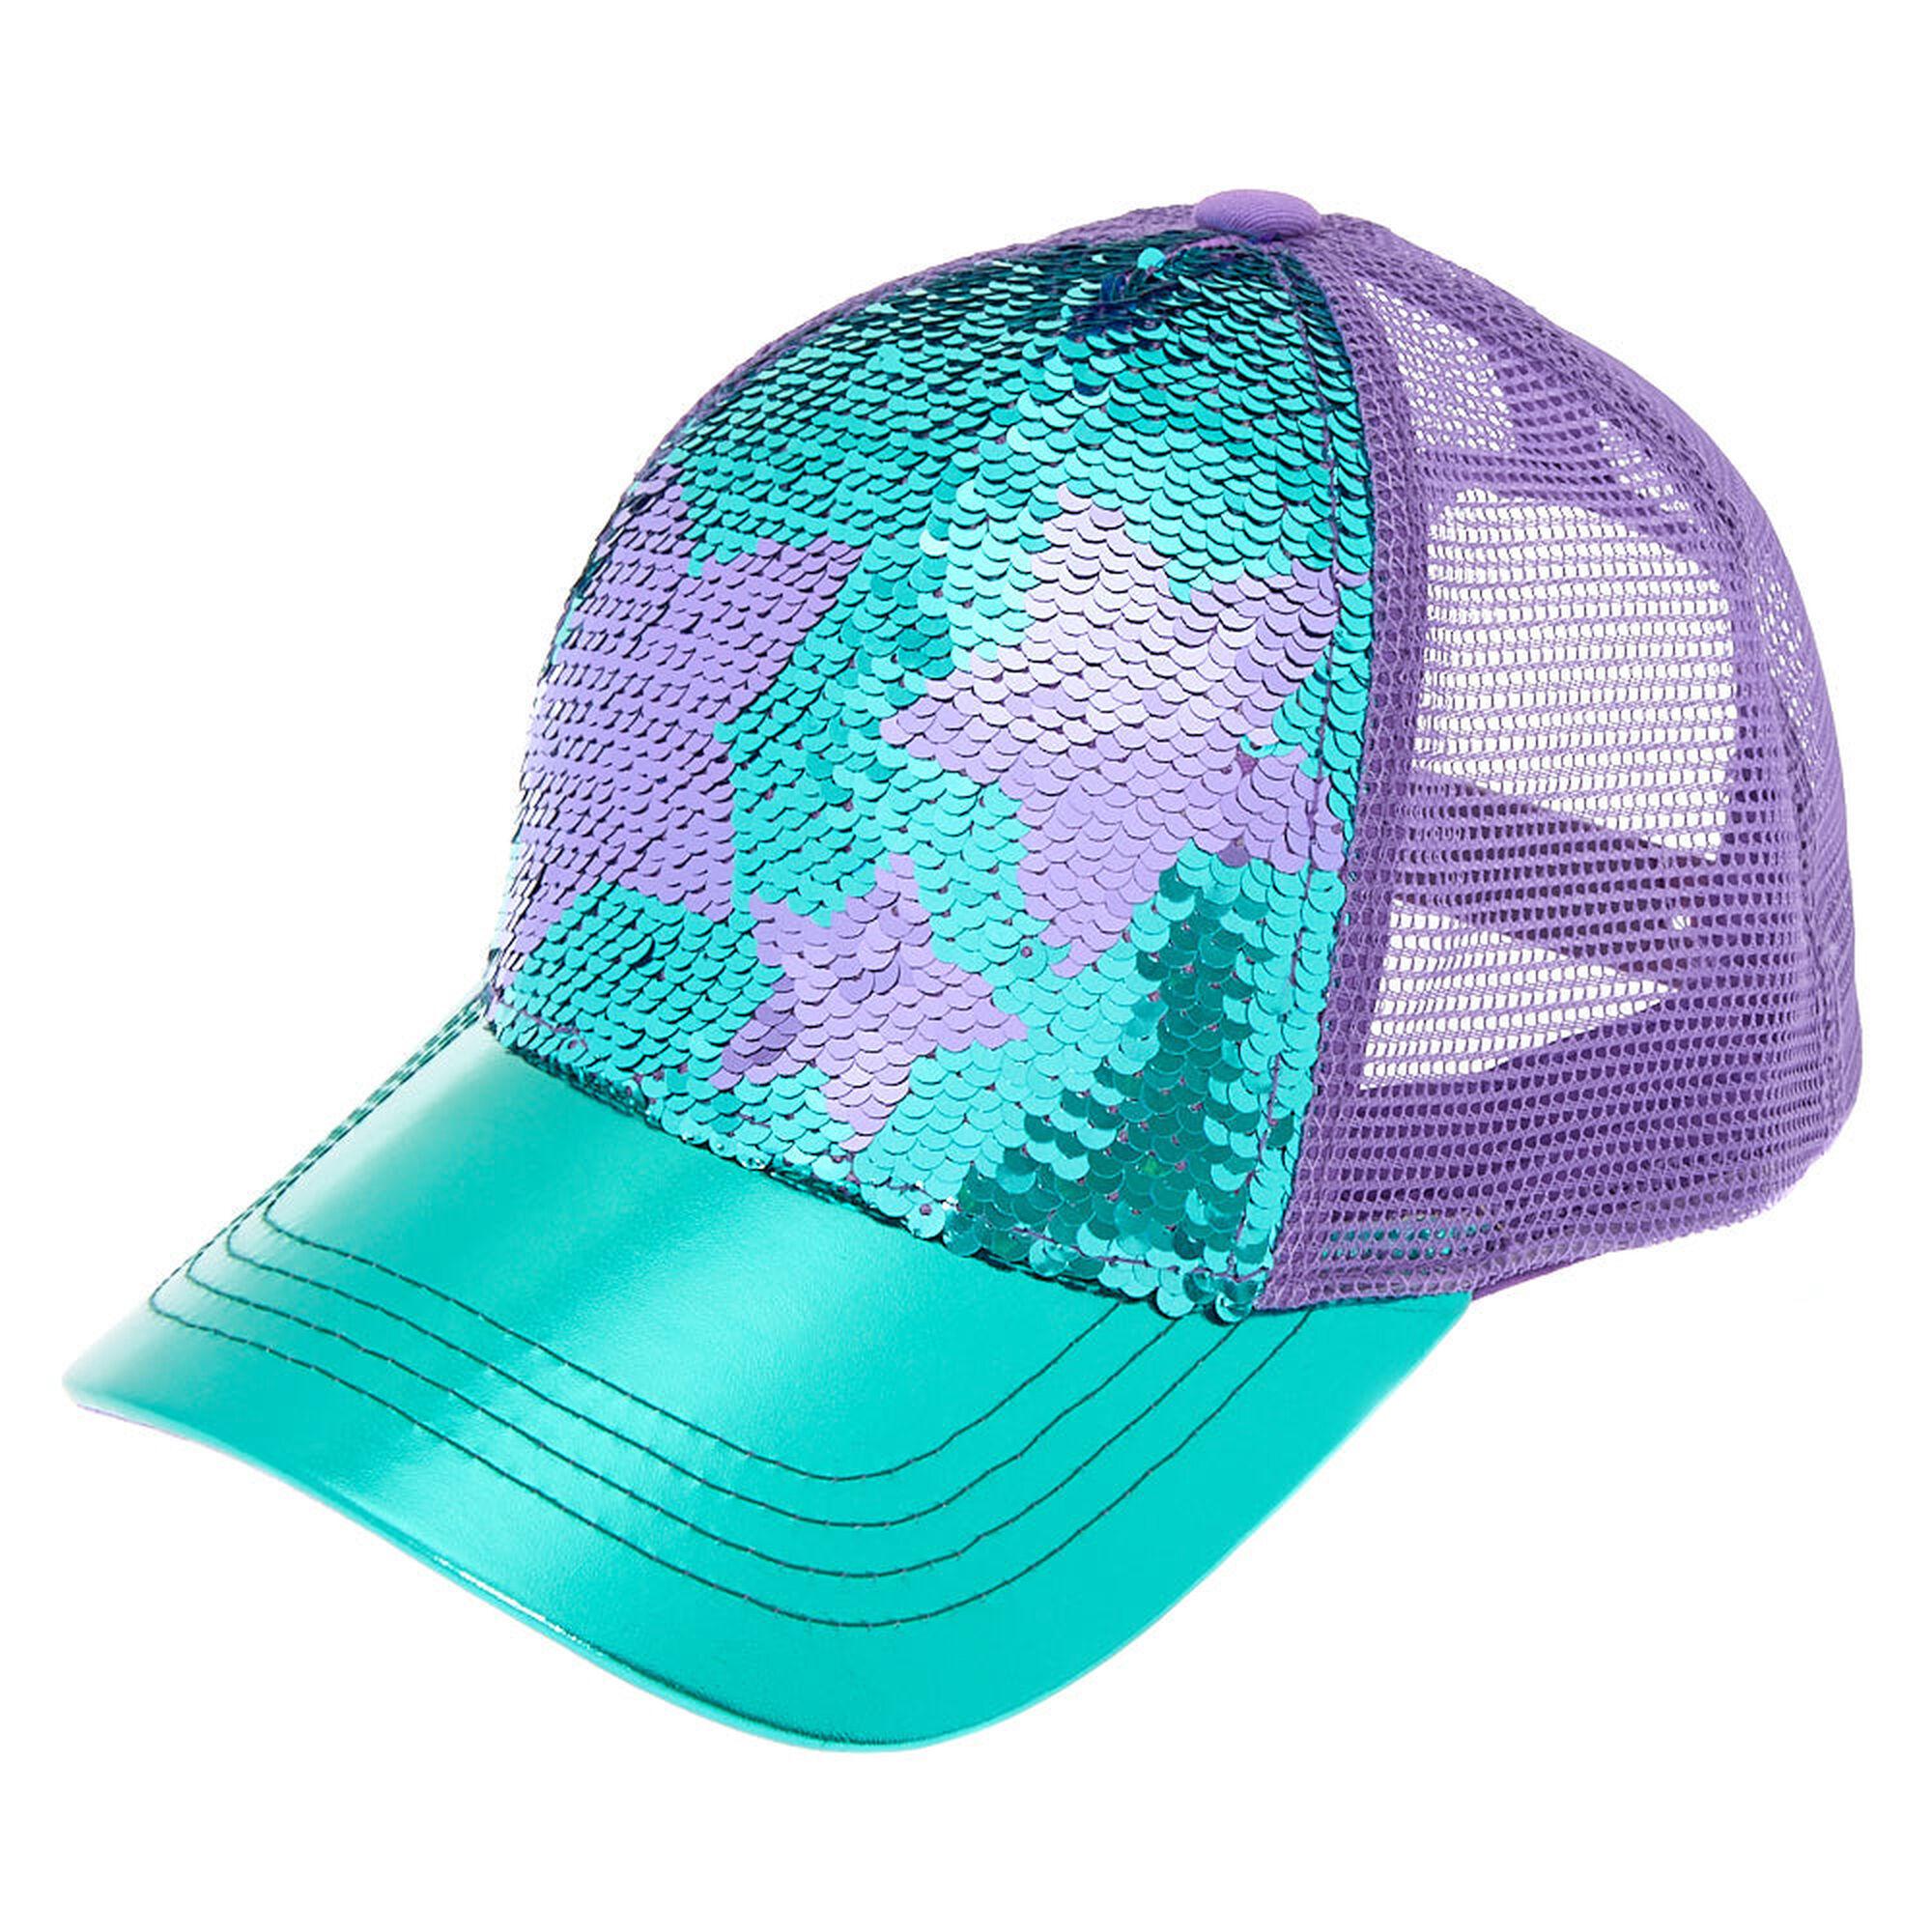 Star Sequin Baseball Cap - Turquoise  40d89818df0